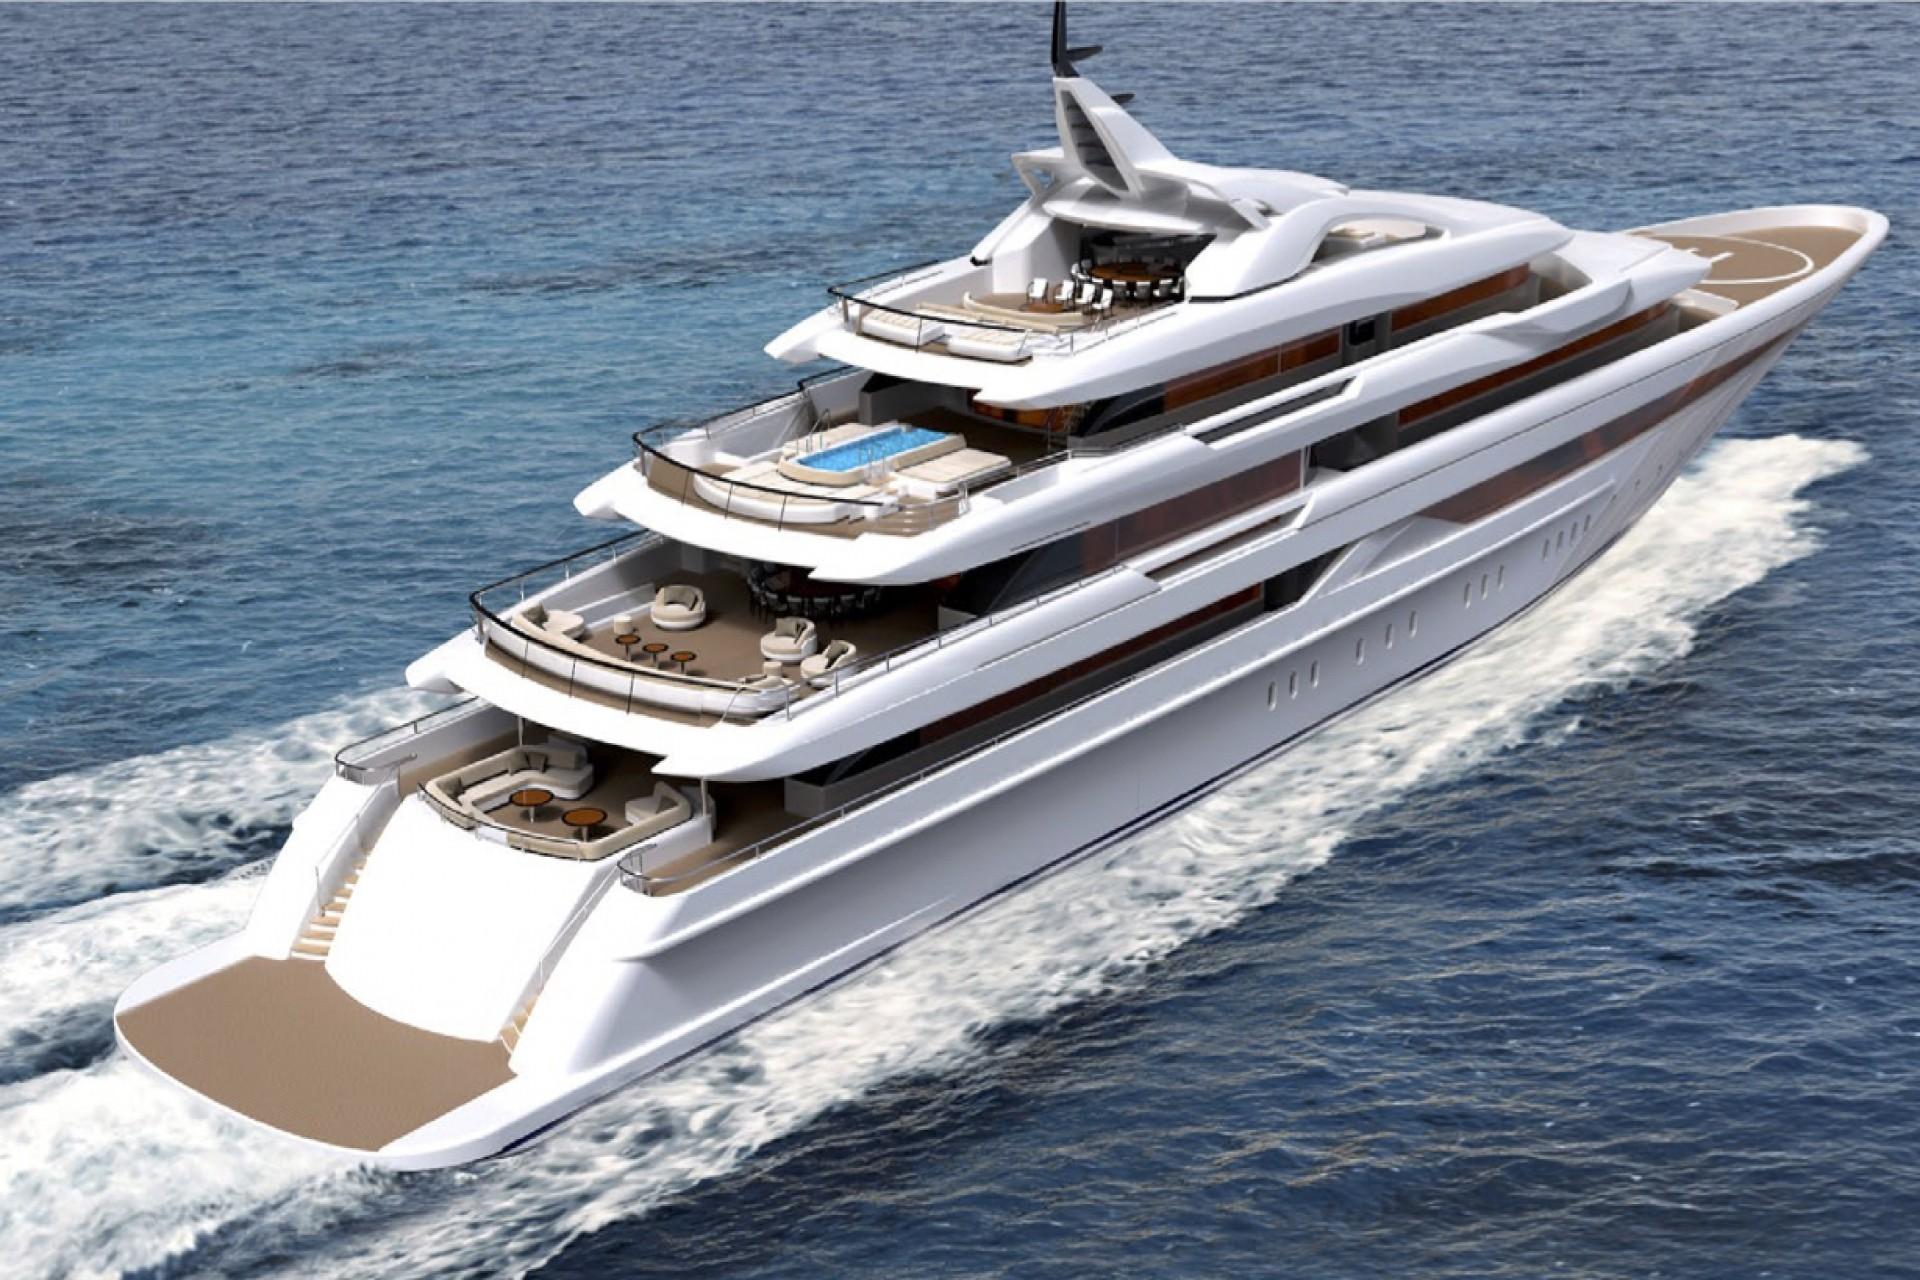 Alquiler de yates en Ibiza. Alquiler de barcos baratos en Ibiza. Yates de alquiler